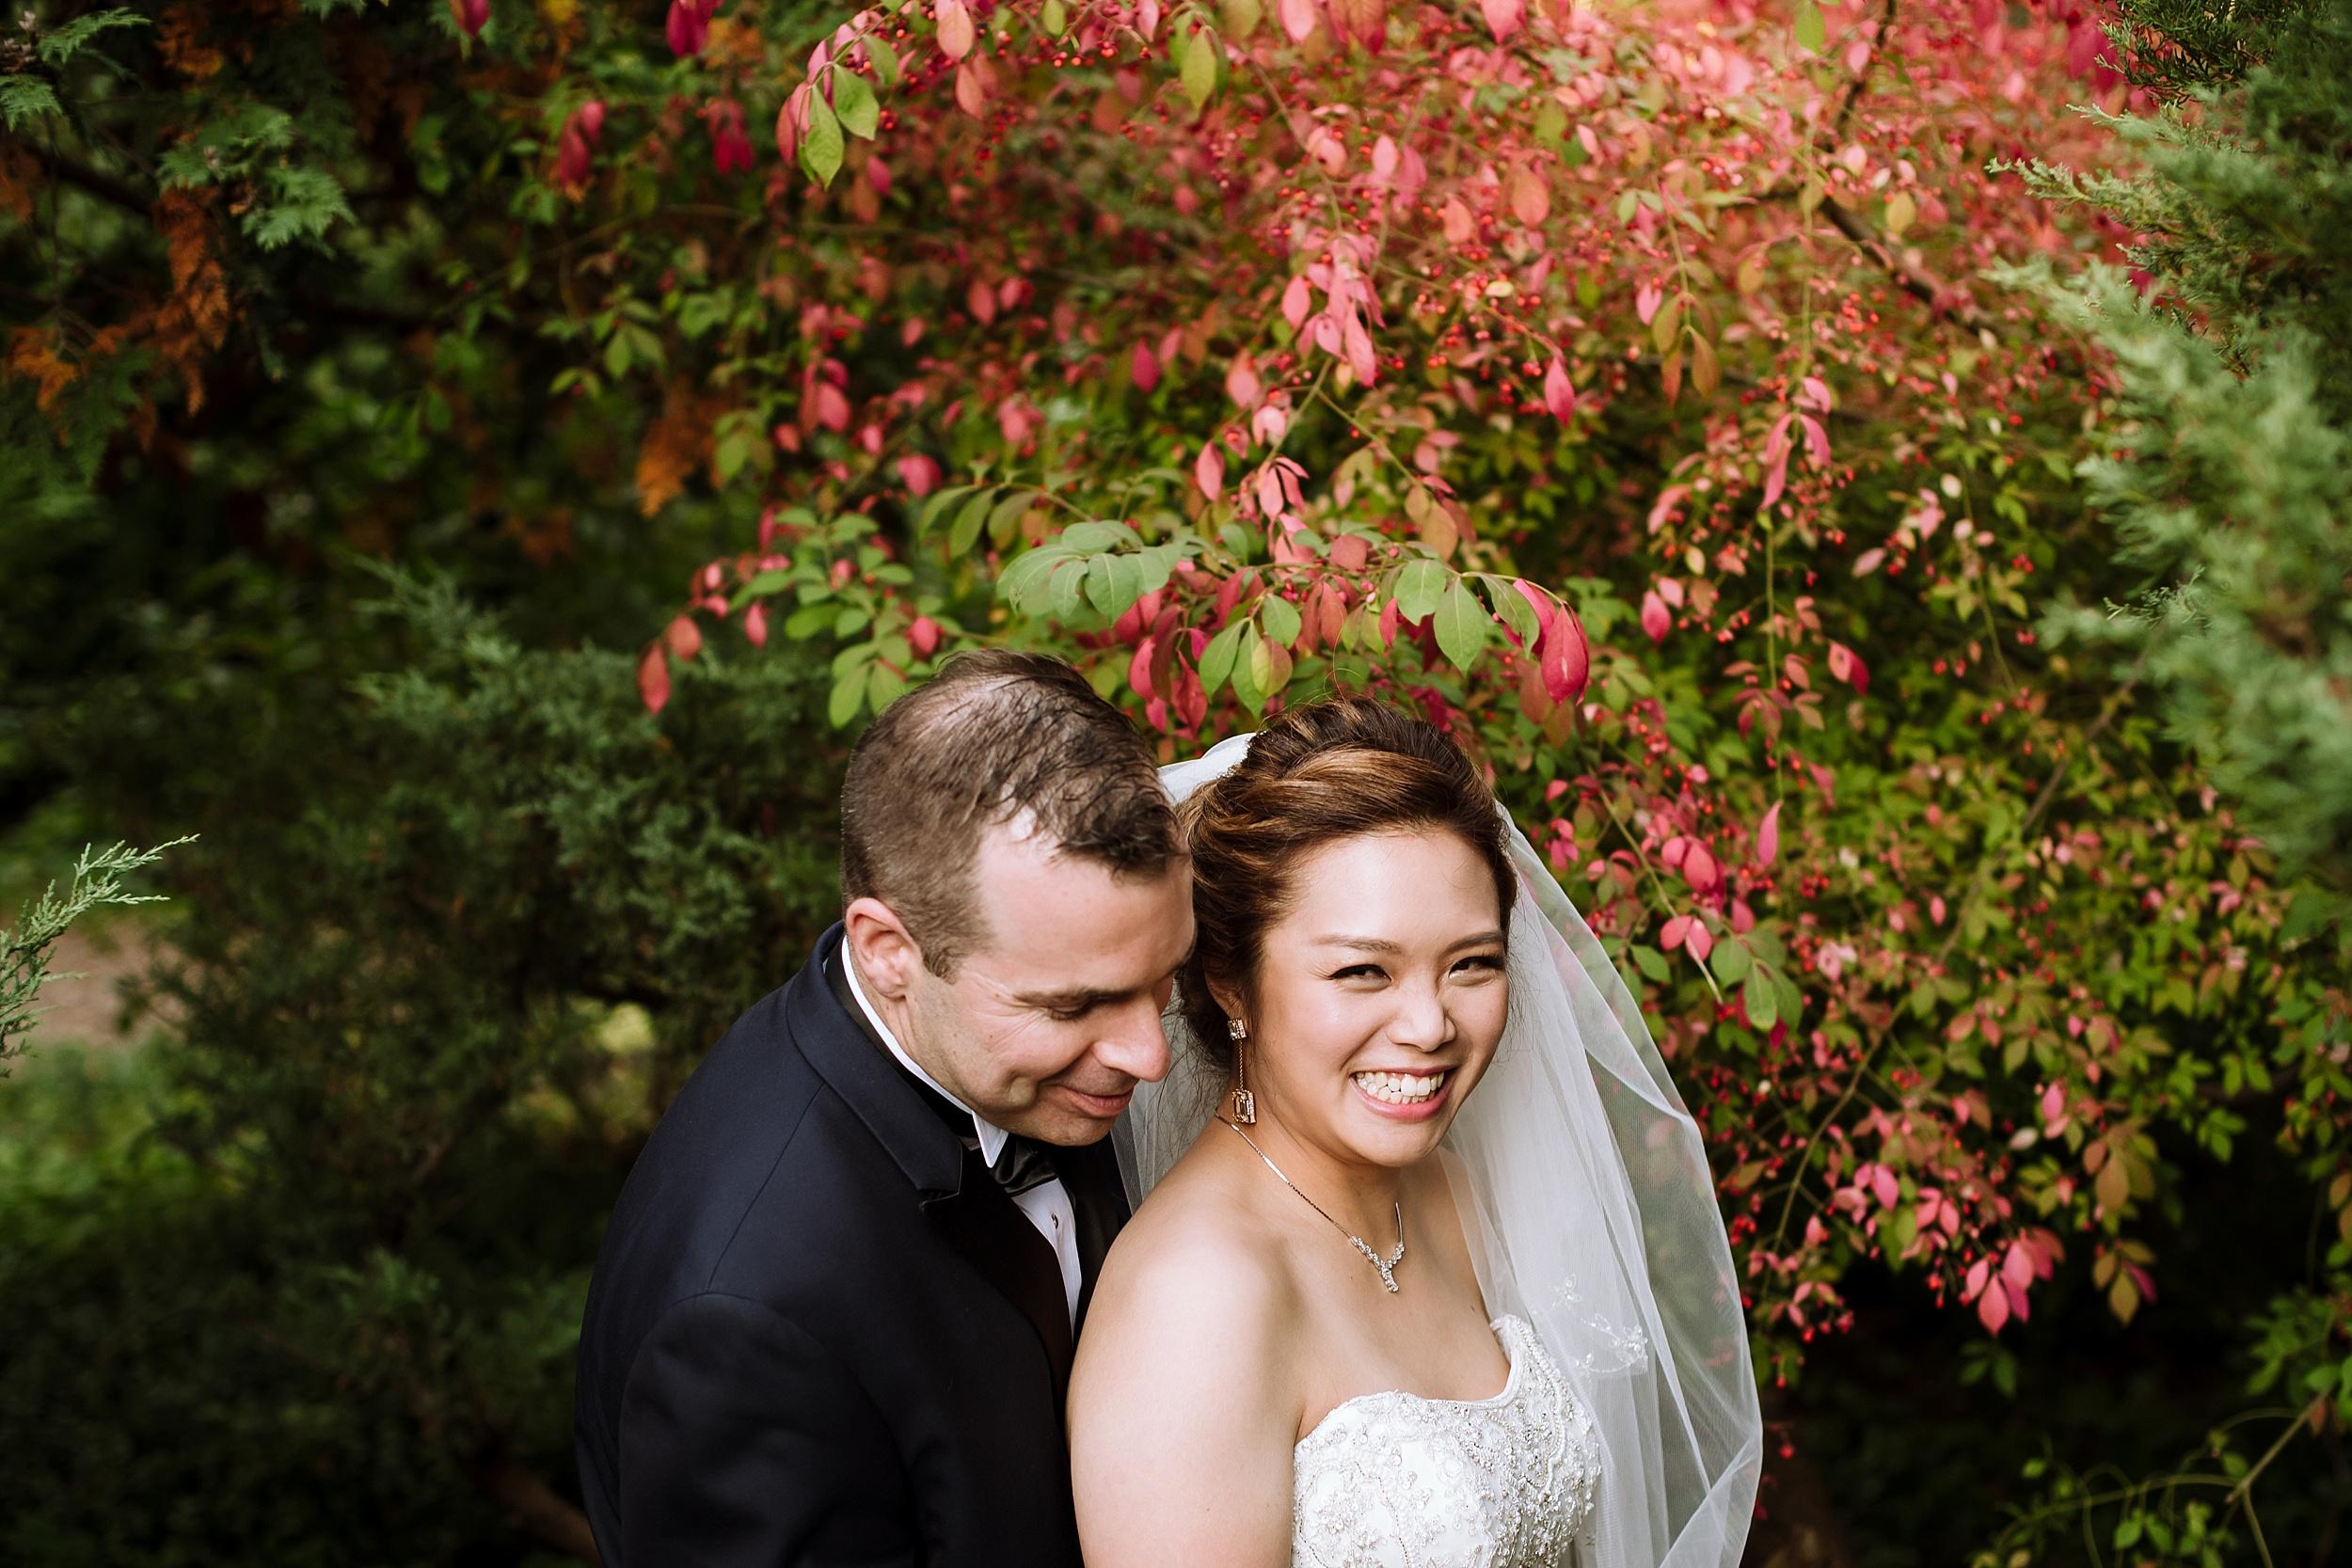 Sunnybrook_Estates_Alexander_Muir_Toronto_Wedding_Photographer_0012.jpg